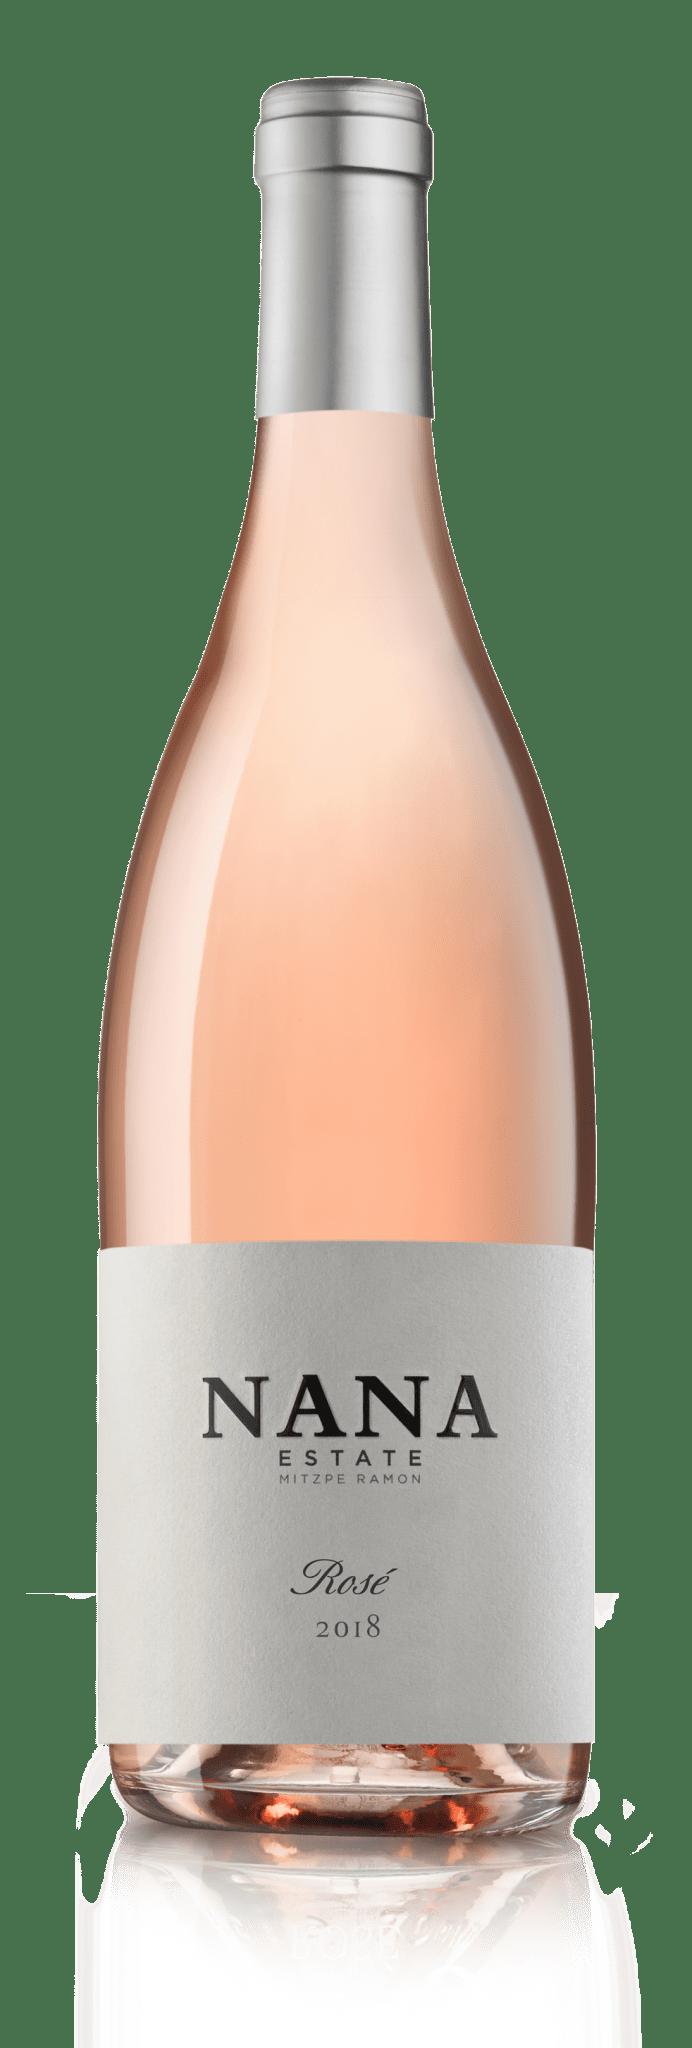 Rose 2019 - 750ml